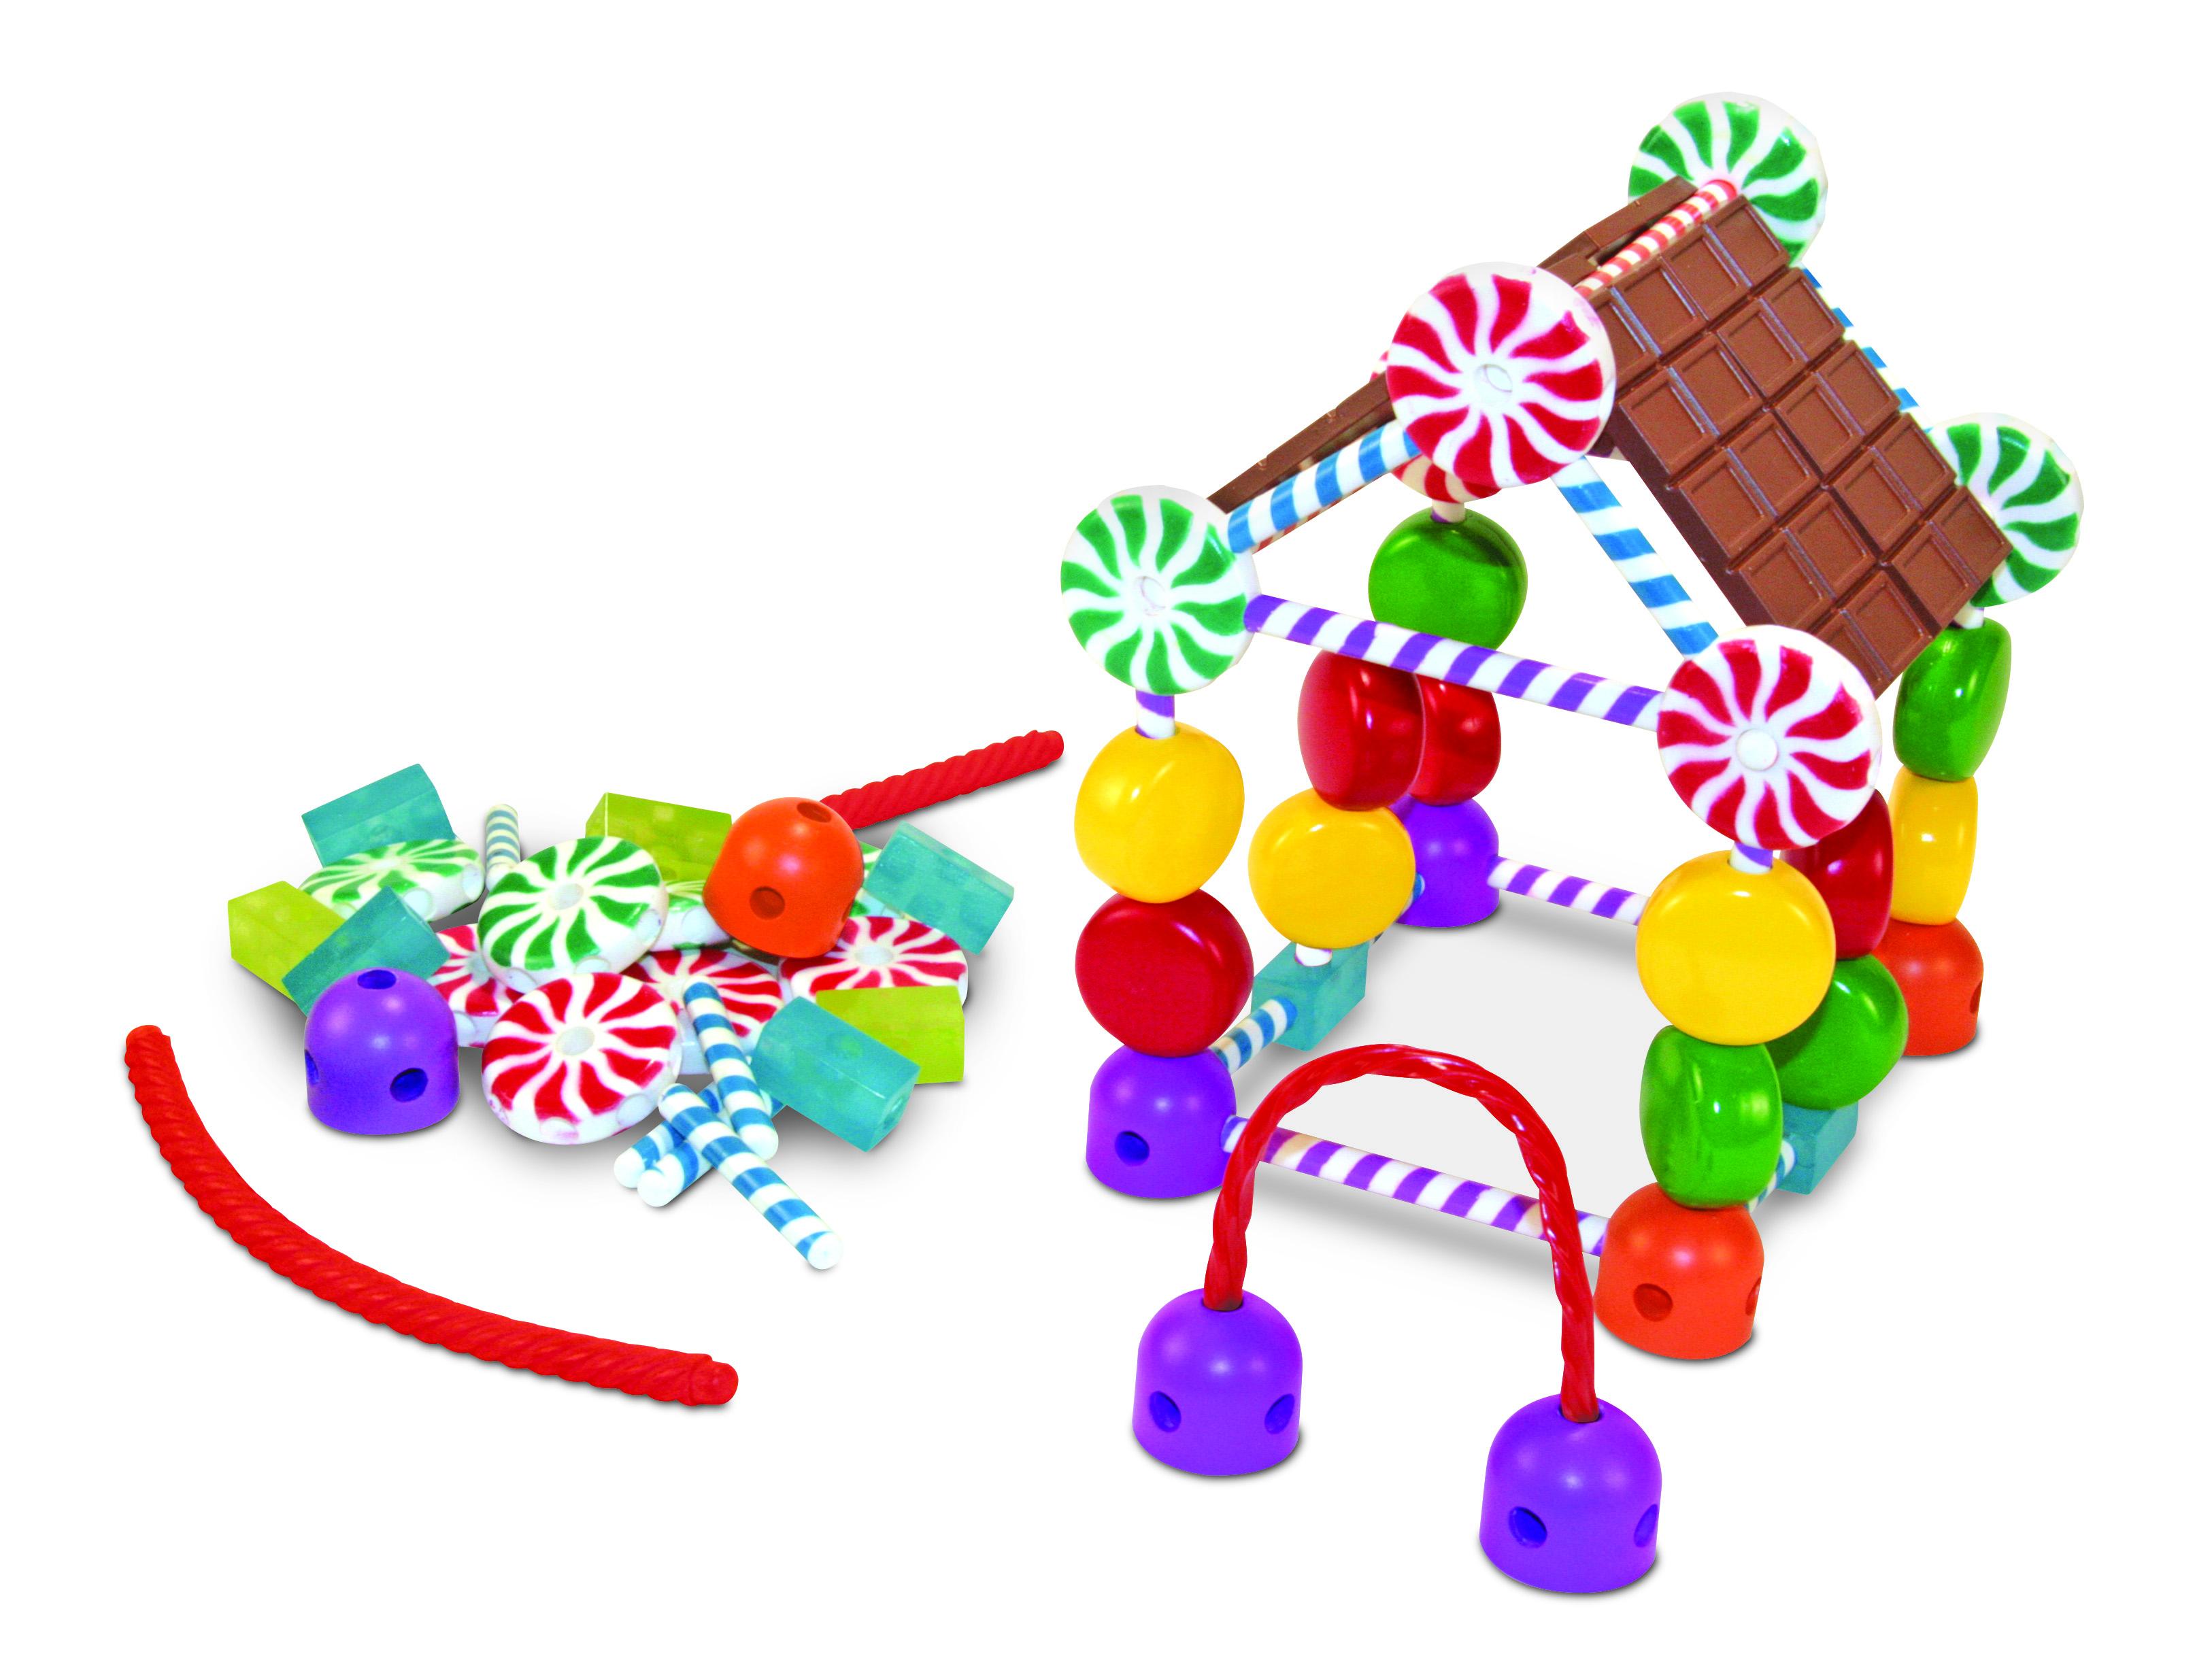 5020 Candy Construction-TEMP